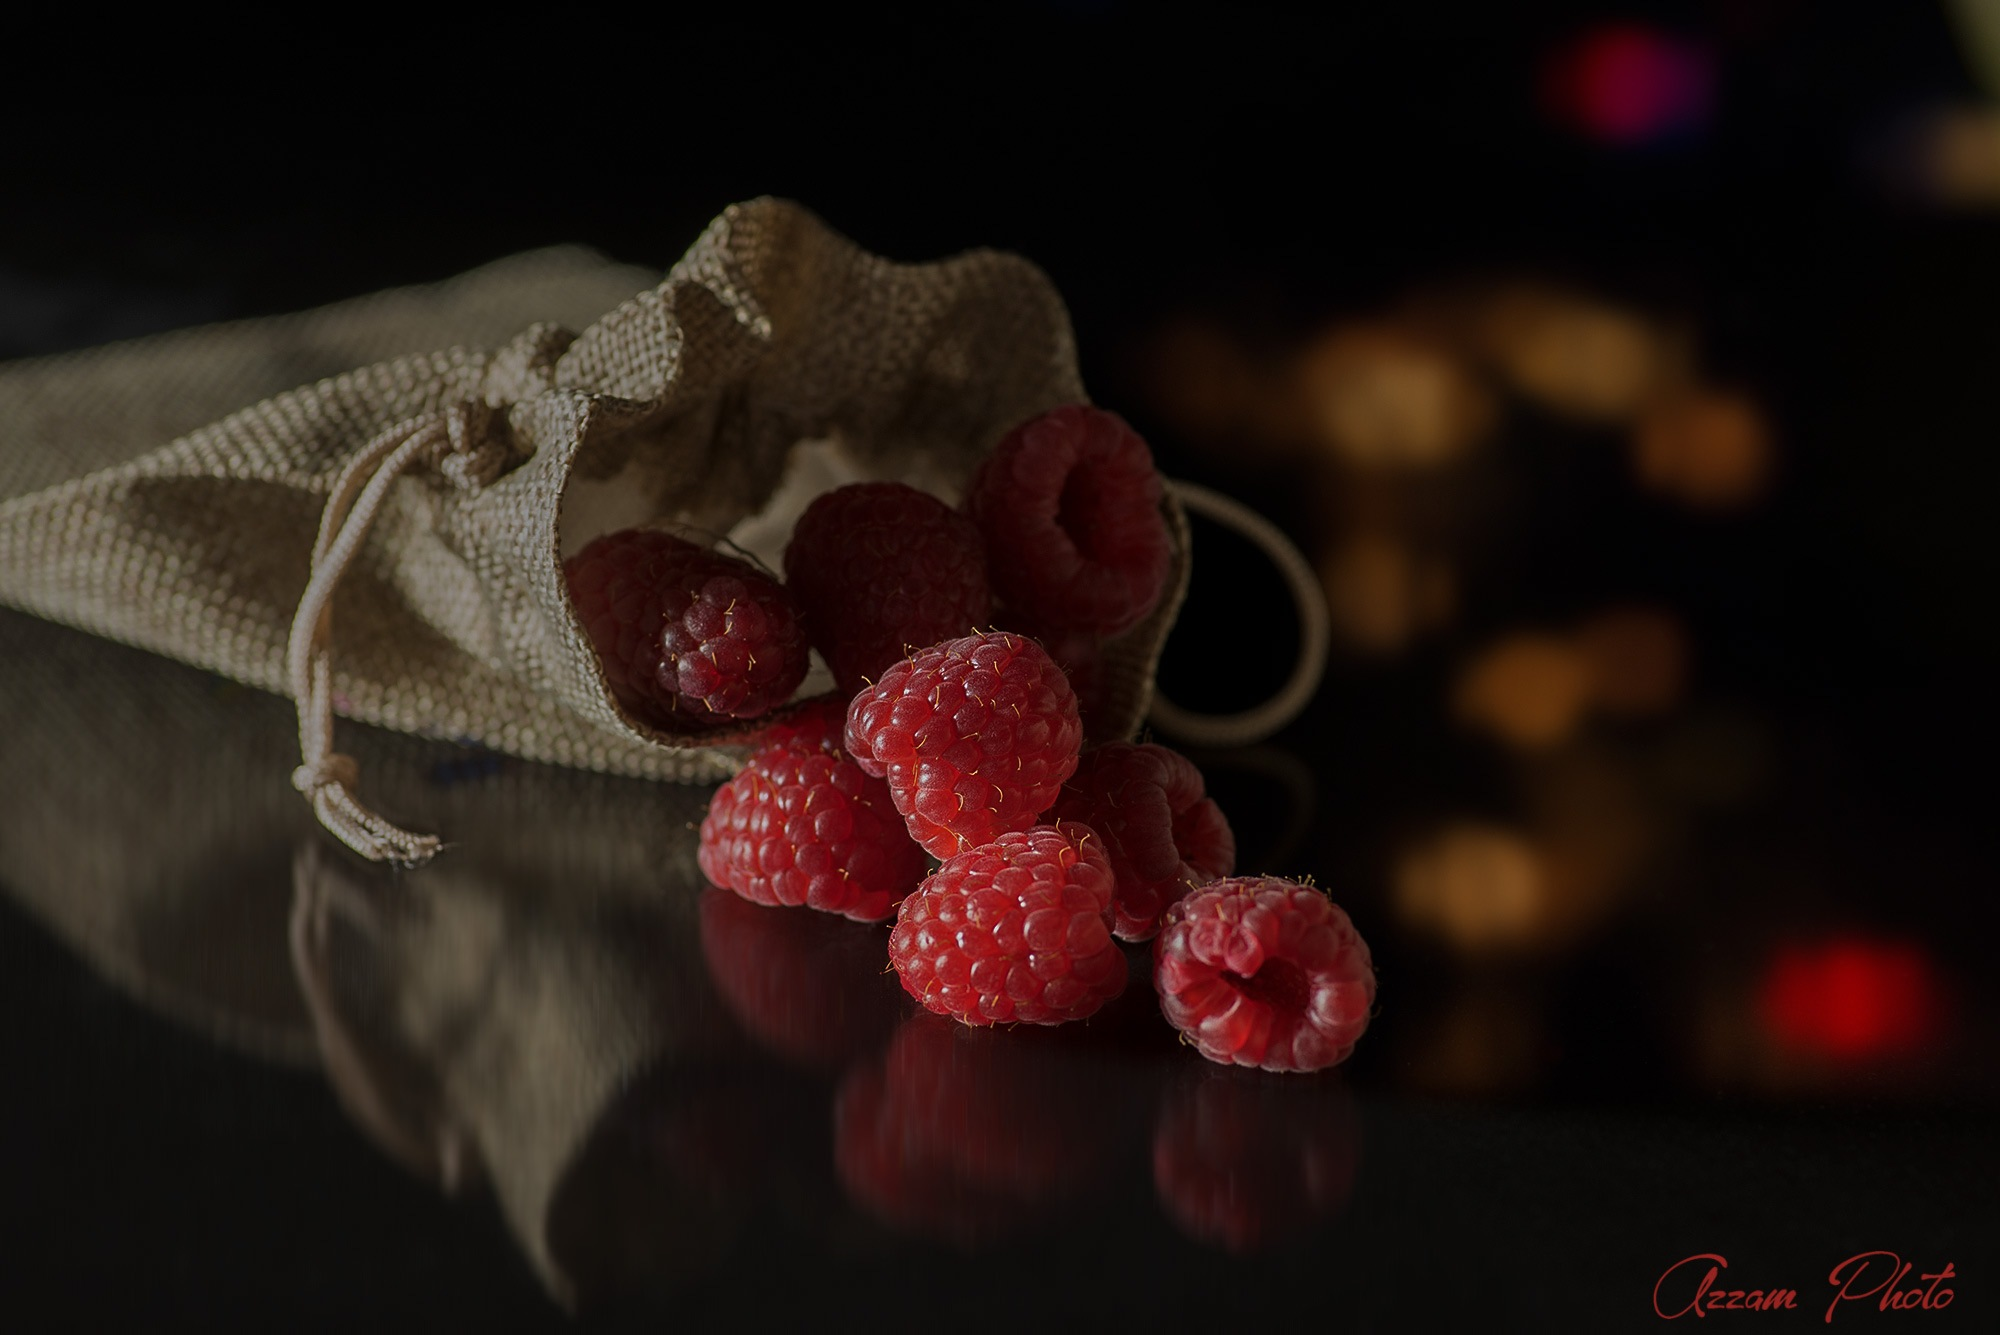 Untitled by Azzam Qourti